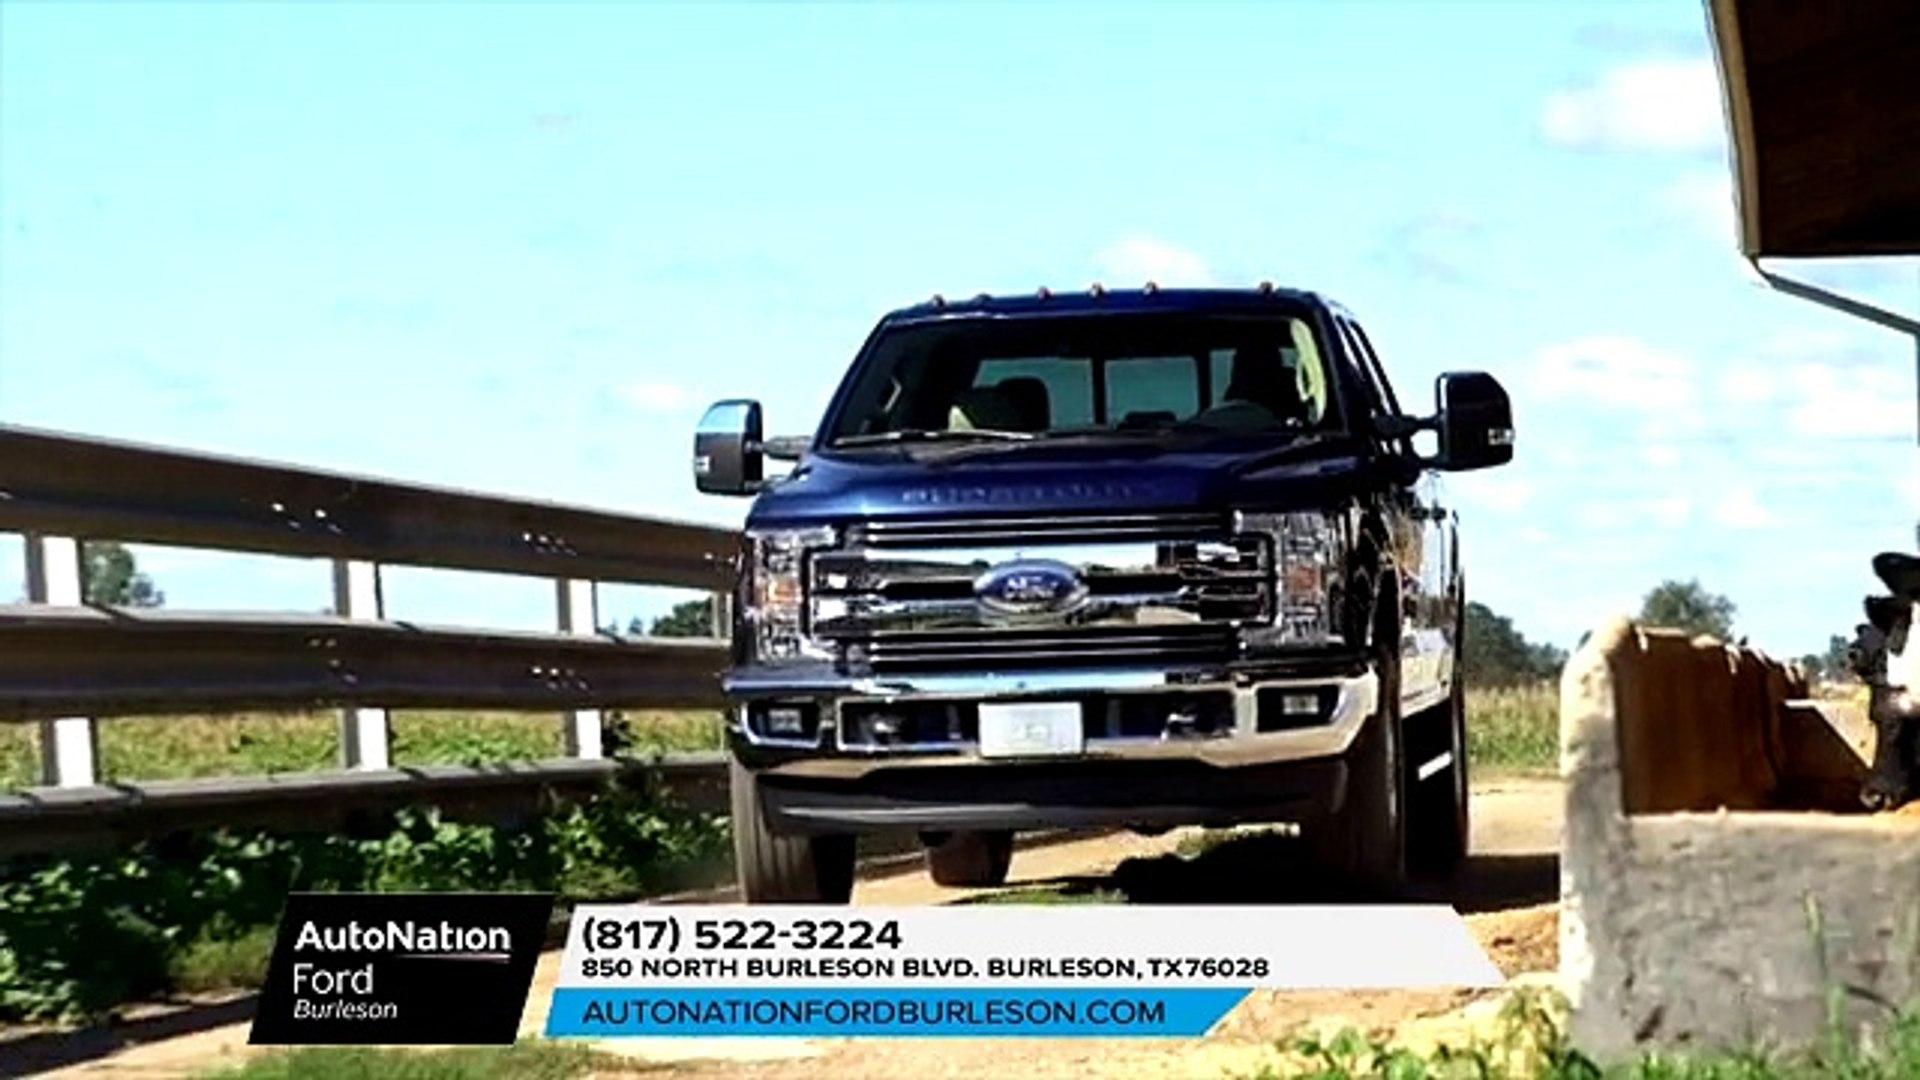 Autonation Ford Burleson >> 2018 Ford F 250 Arlington Tx Ford F 250 Dealer Arlington Tx